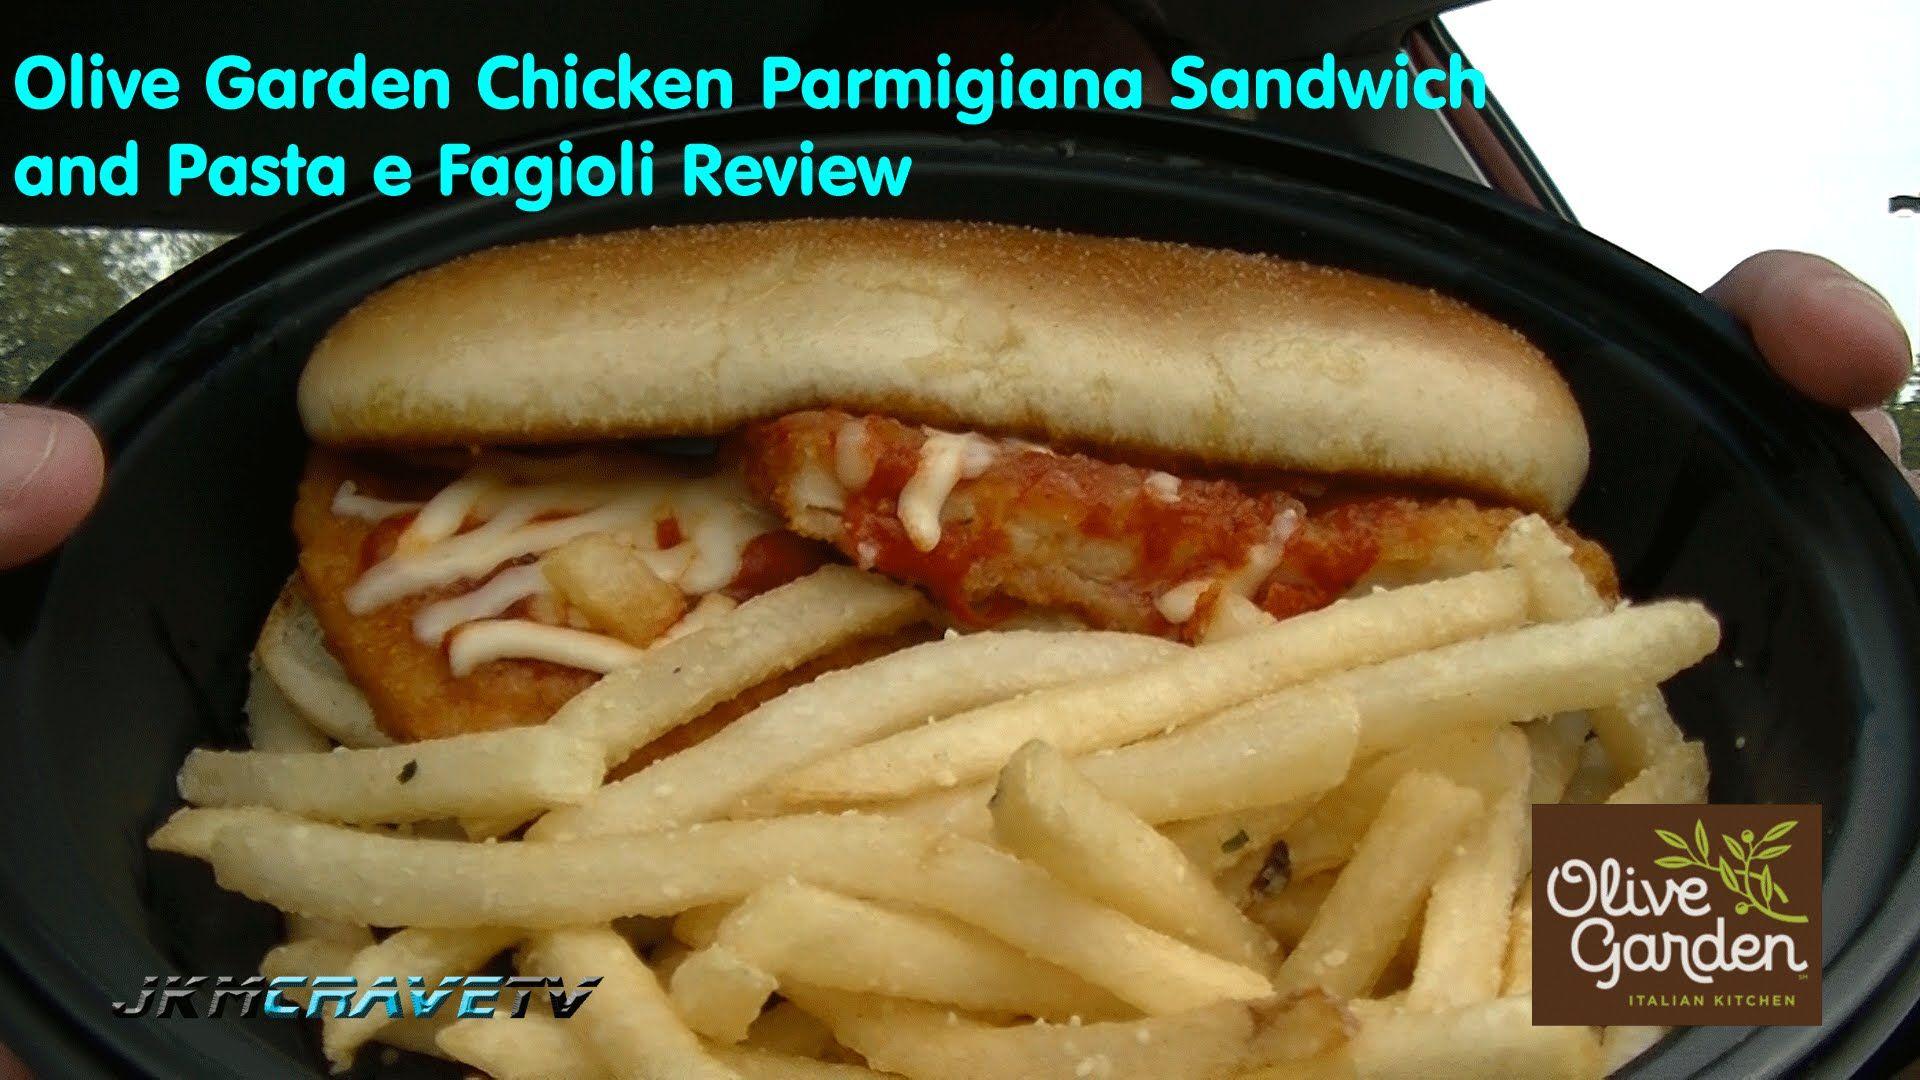 Olive Garden Chicken Parmigiana and Pasta e Fagioli Review ...